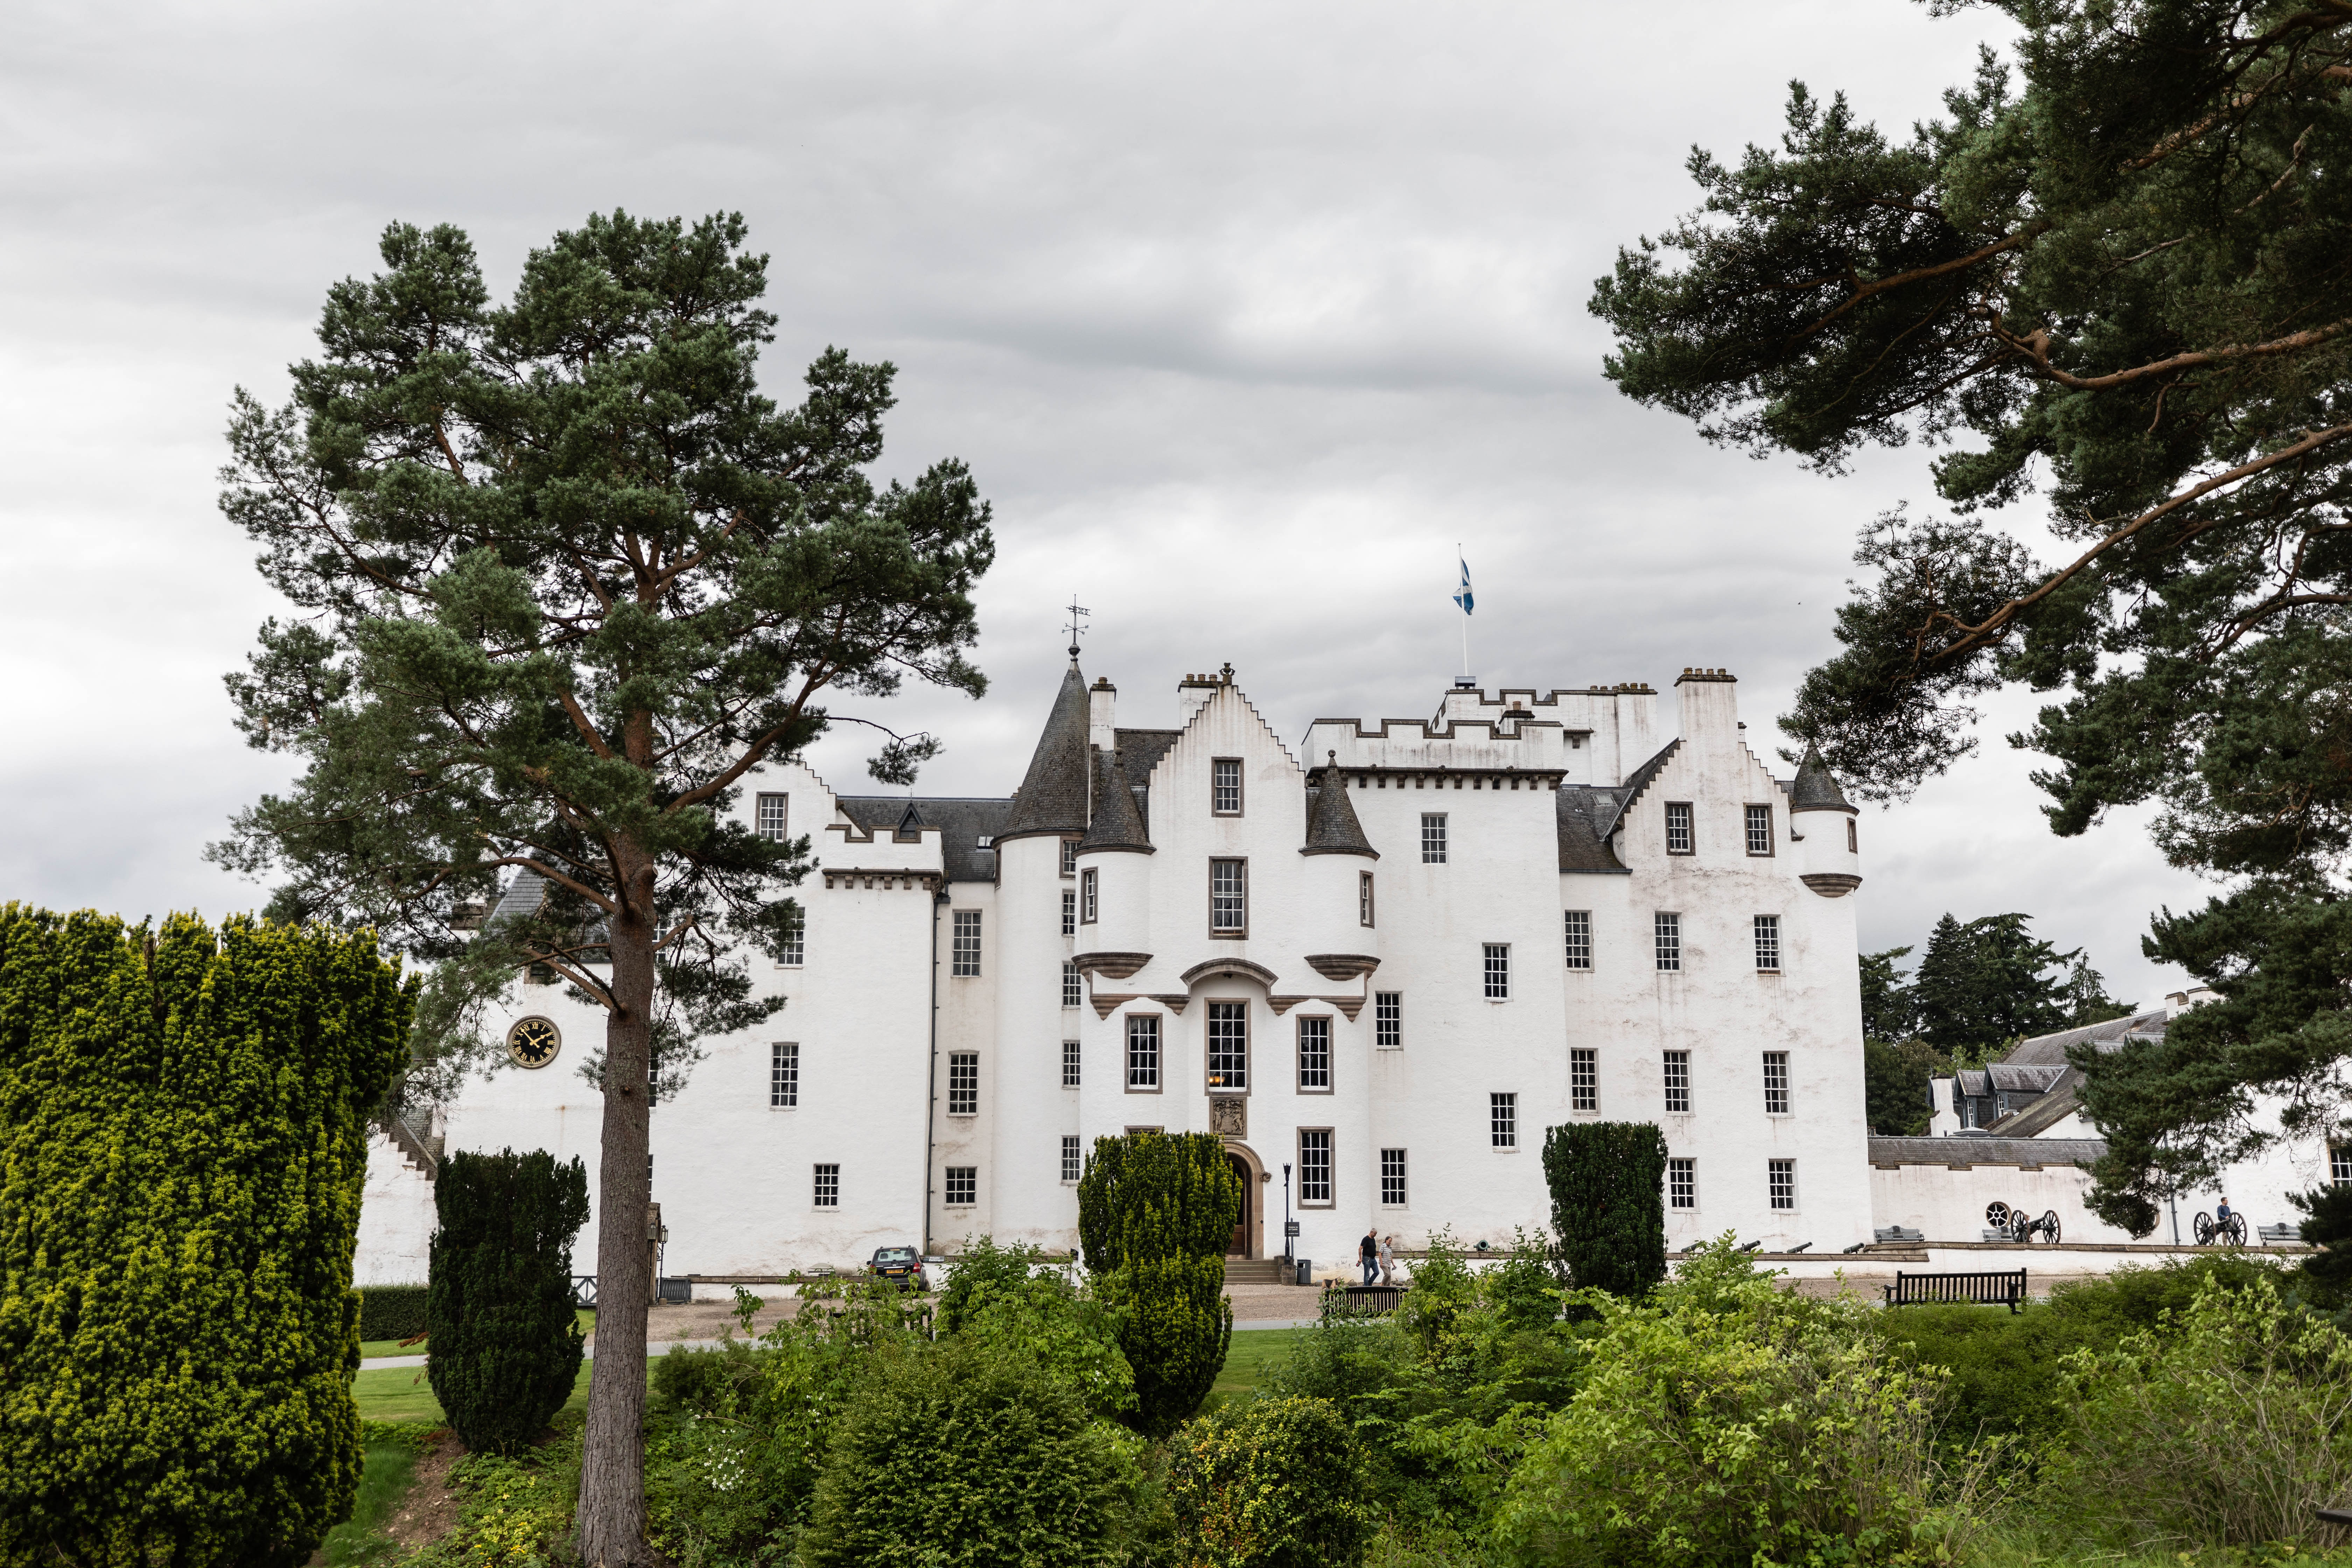 Blair Castle in Glen Garry Blair Atholl, Scotland Beautiful European Castles National Gardens United Kingdom by Annie Fairfax